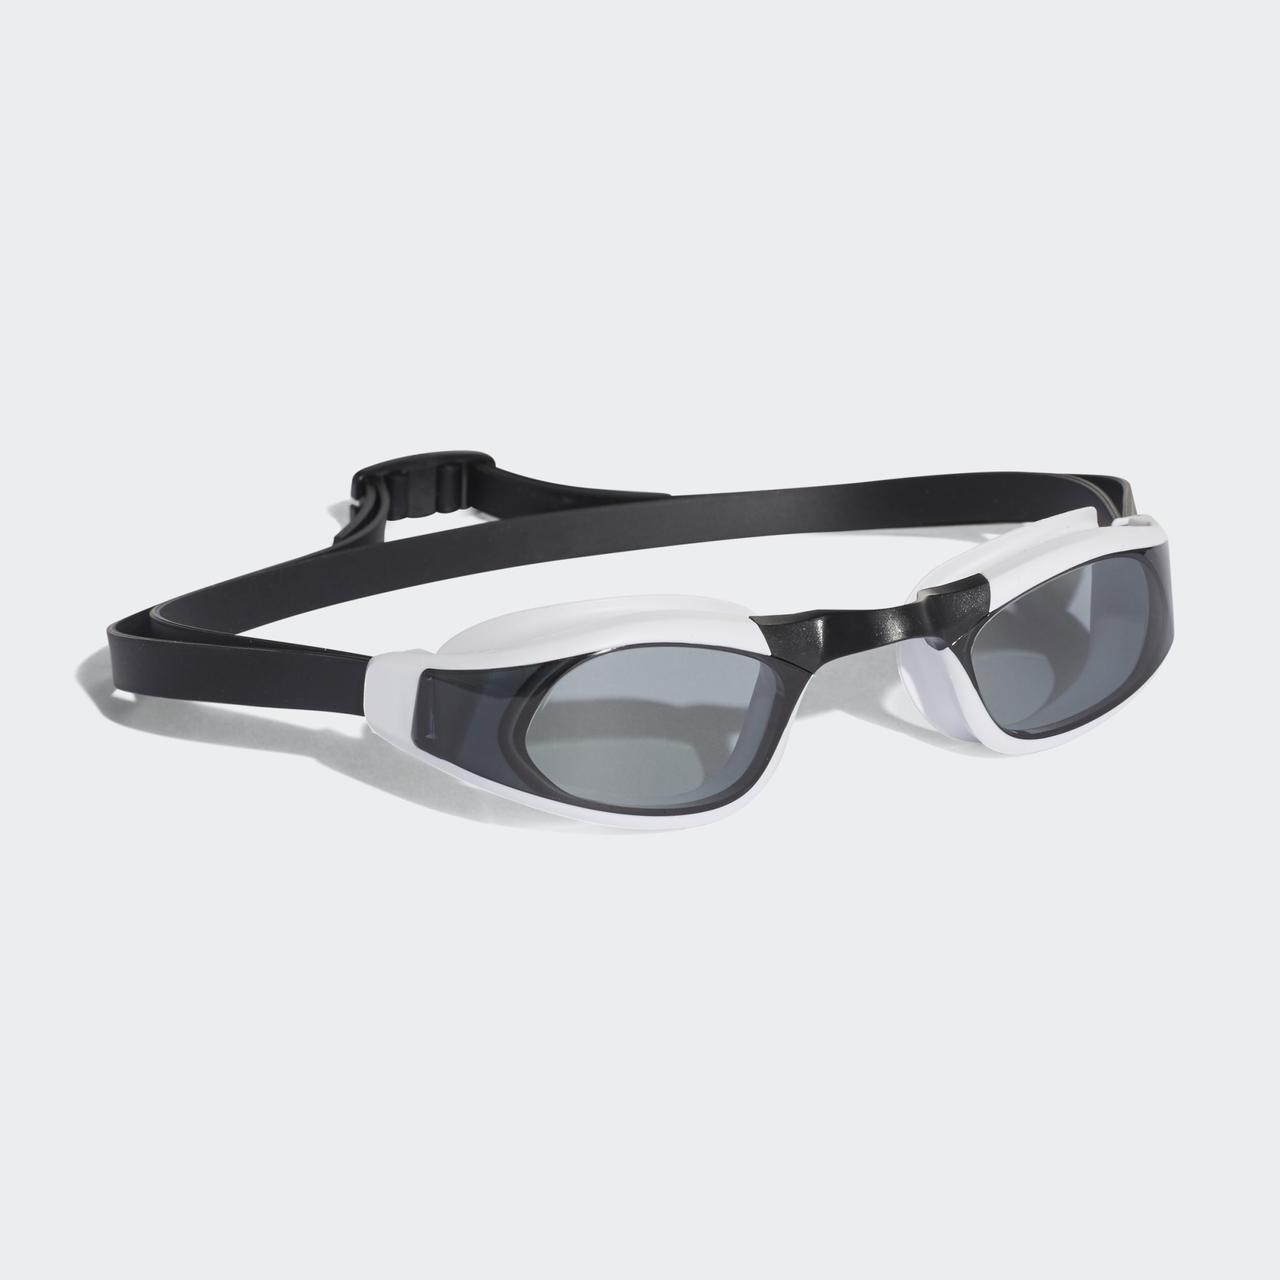 Очки для плавания Persistar Race Unmirrored DH4475